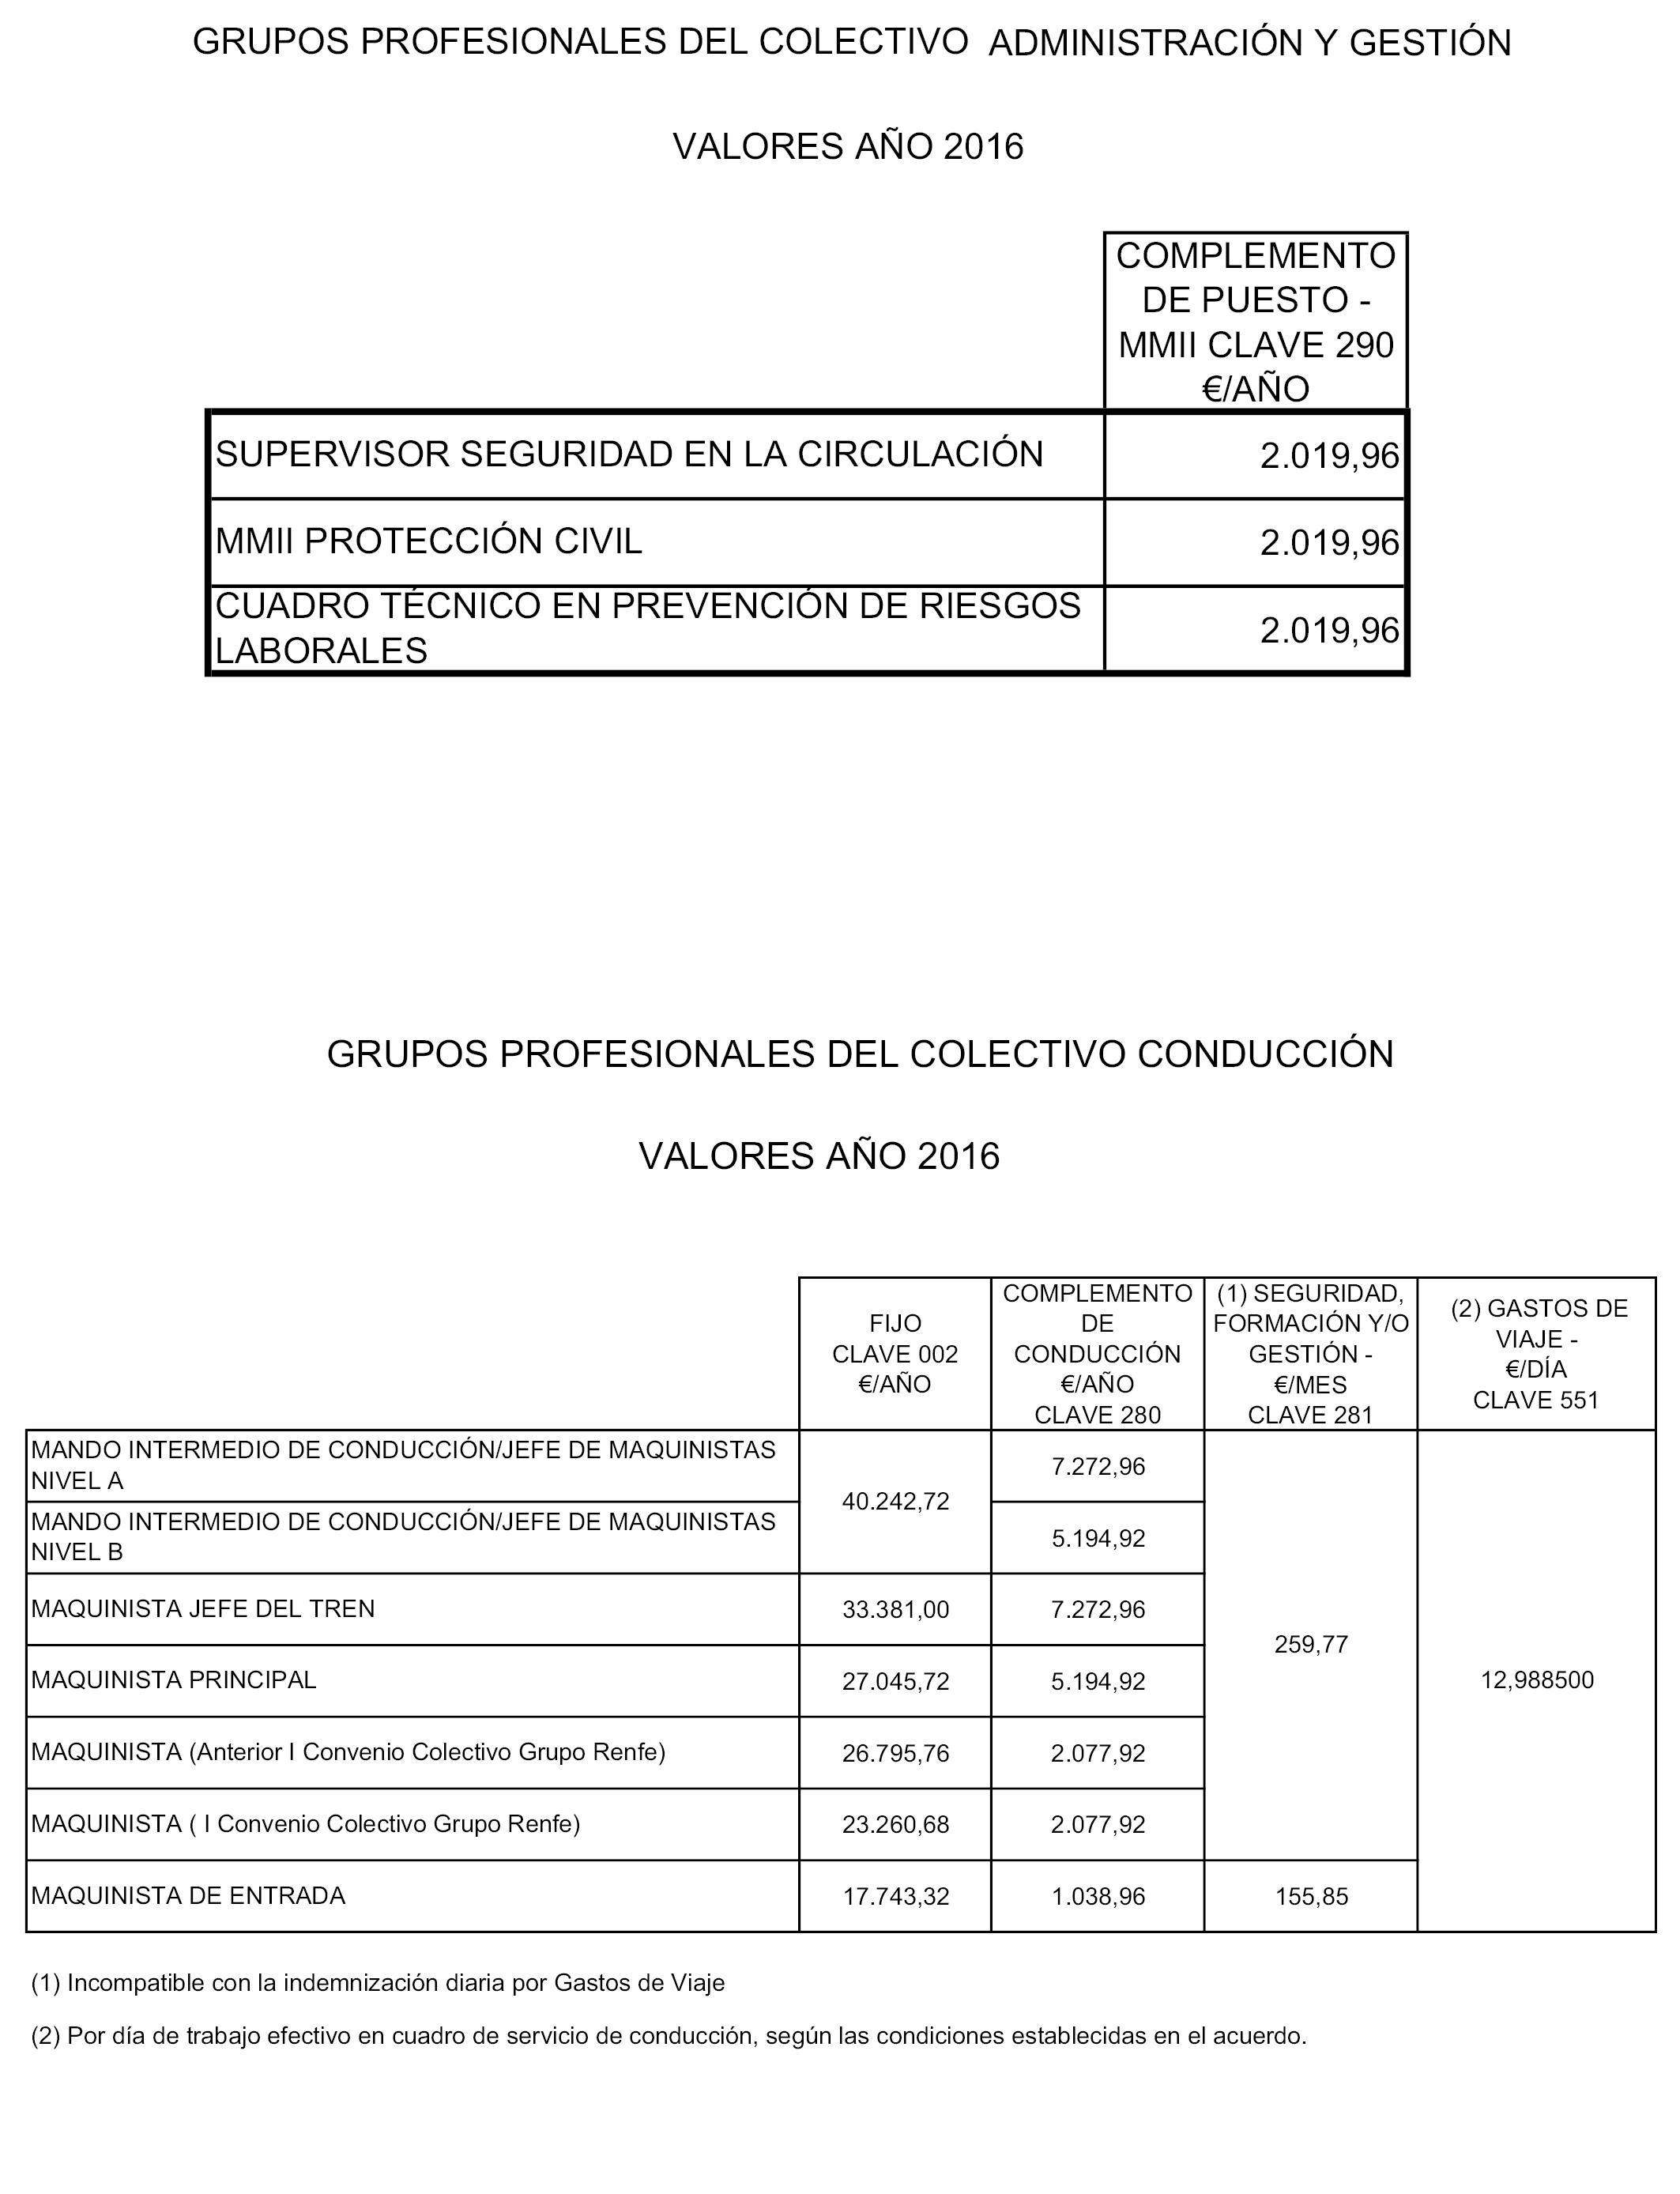 BOE.es - Documento BOE-A-2016-11270